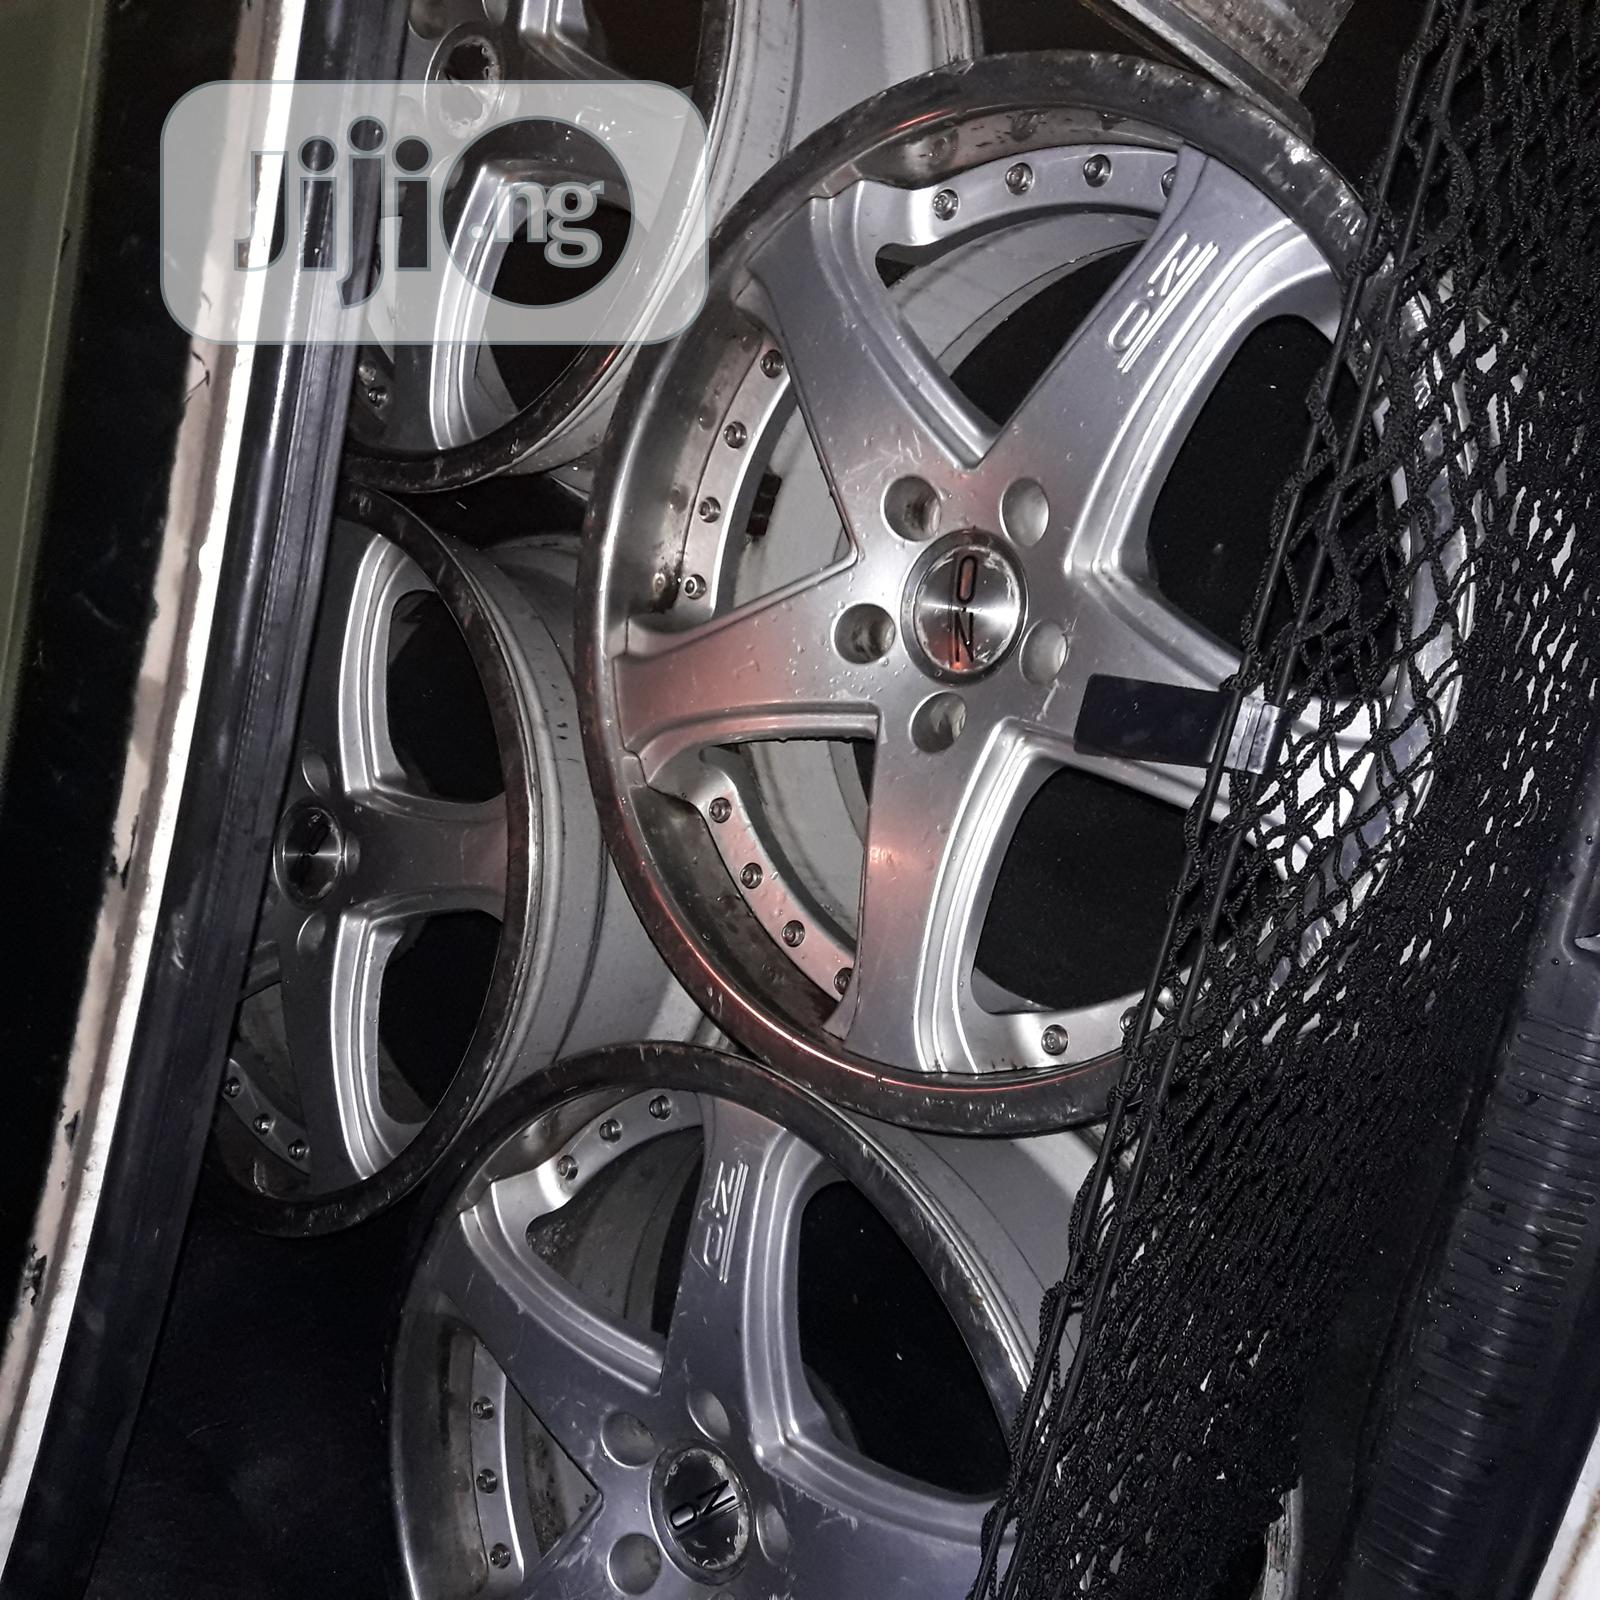 Alloy Wheel 18rim,16rim And 17rim | Vehicle Parts & Accessories for sale in Surulere, Lagos State, Nigeria